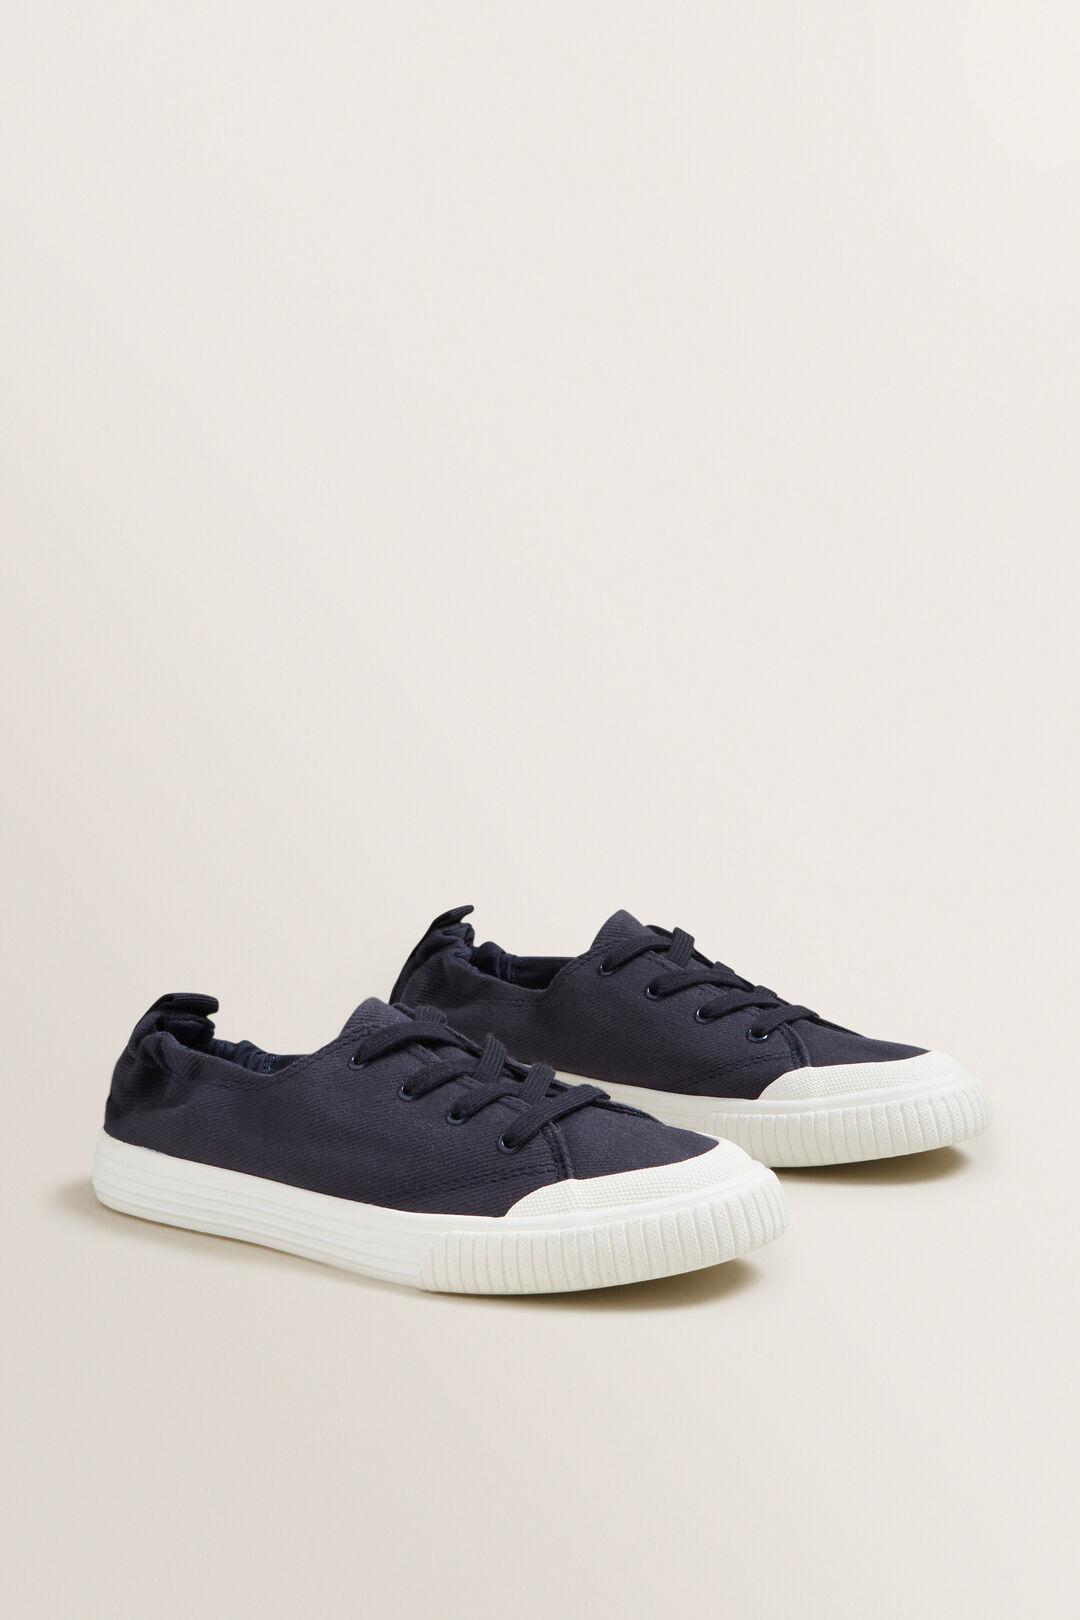 Sienna Canvas Slip-On Sneaker  NAVY  hi-res